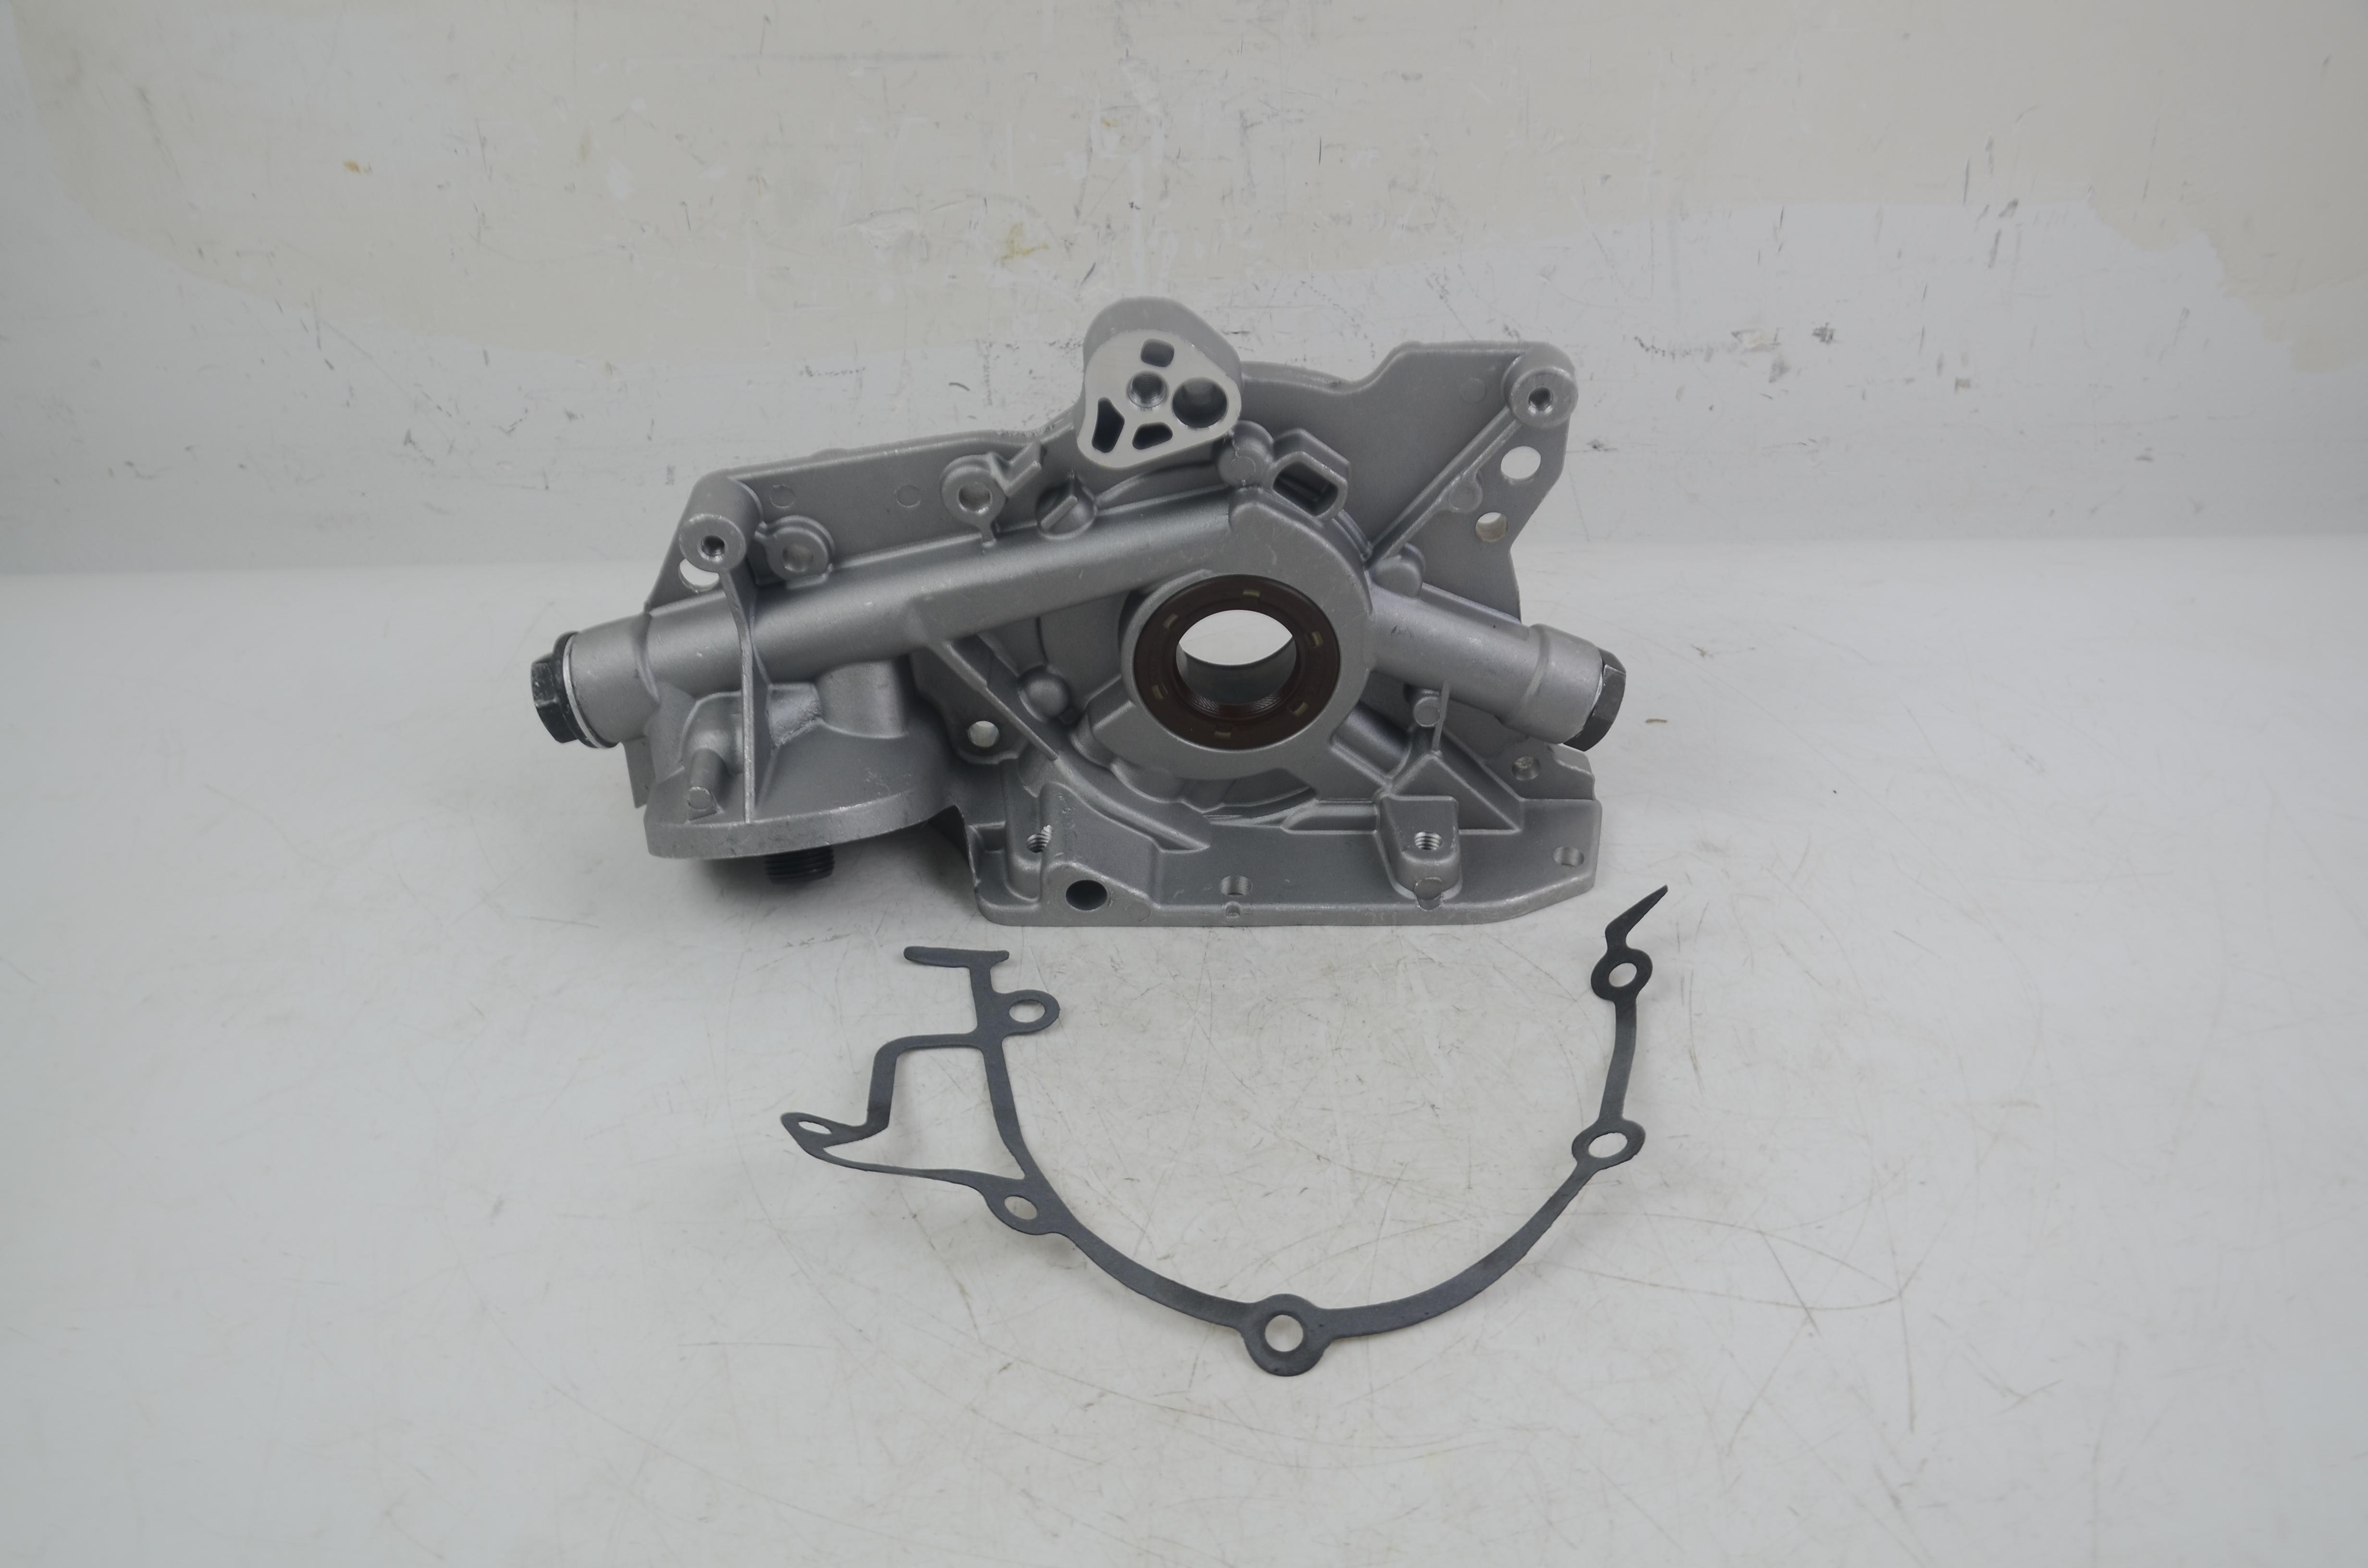 AP02 reforzado de la bomba de aceite para Opel 1,8 2,0 16V C20LET C20XE C20NE 1,8l 2,0l C18XE X20XEV Turbo